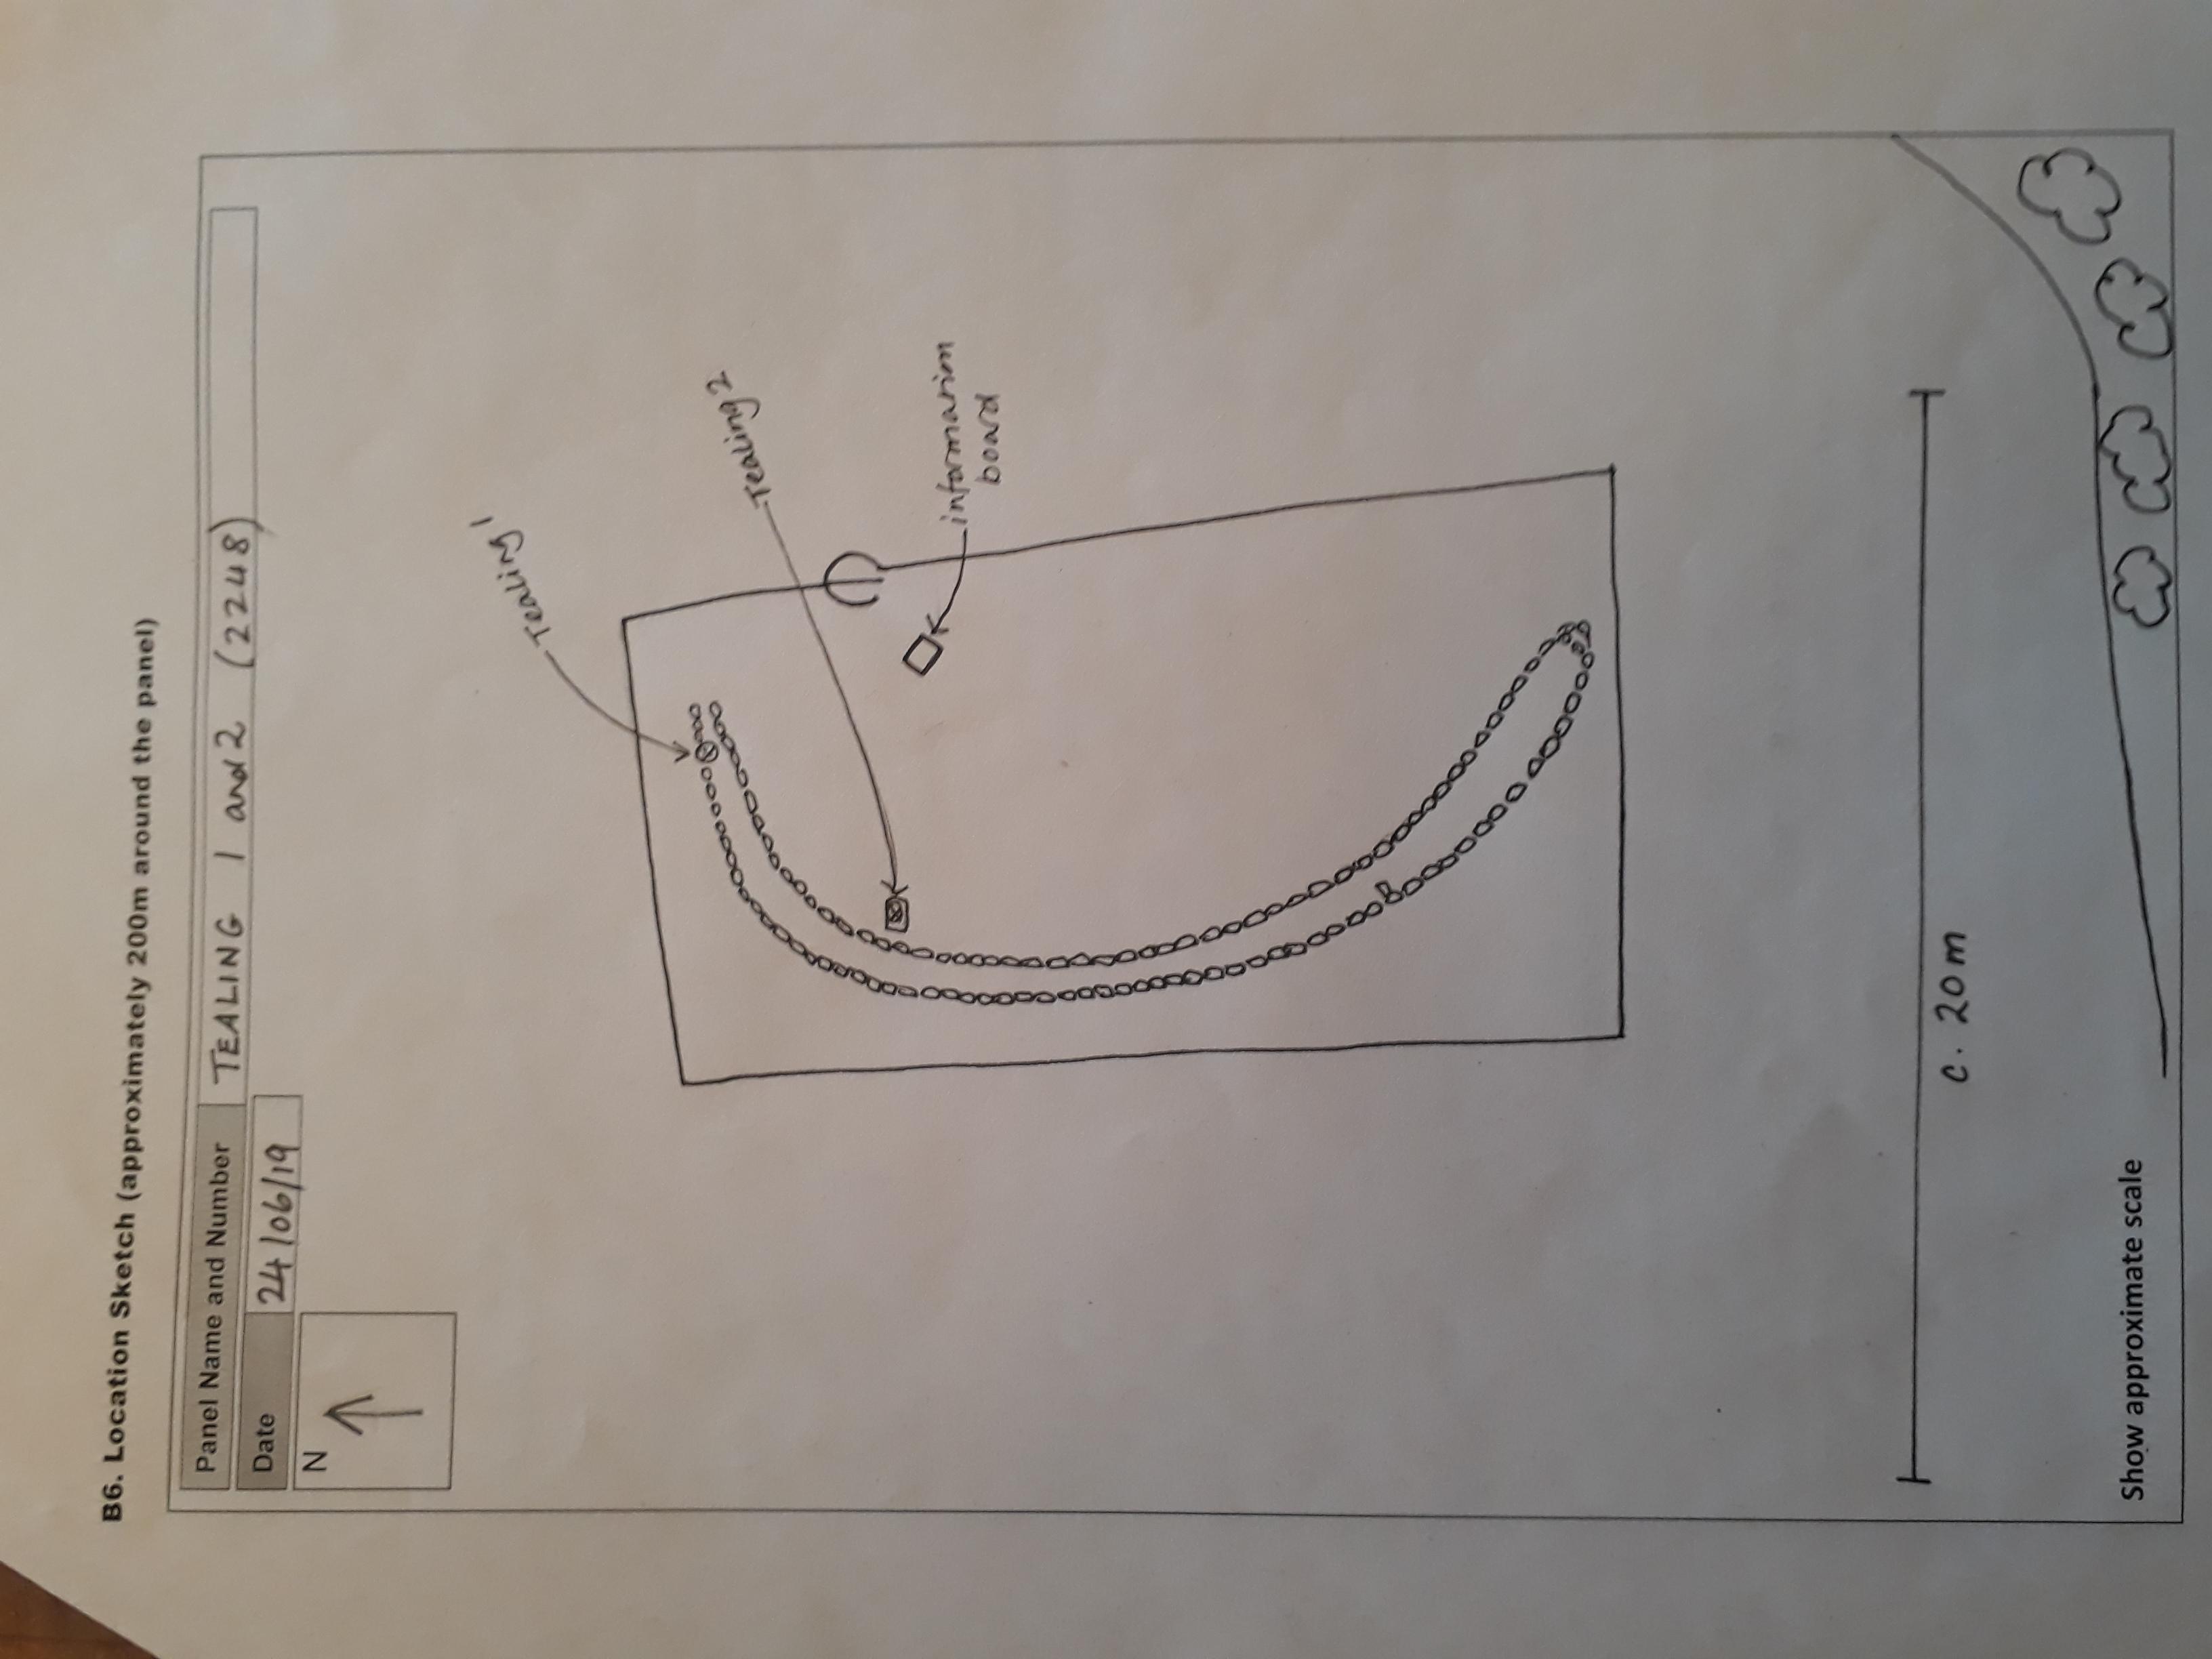 TEALING 1: Location sketch